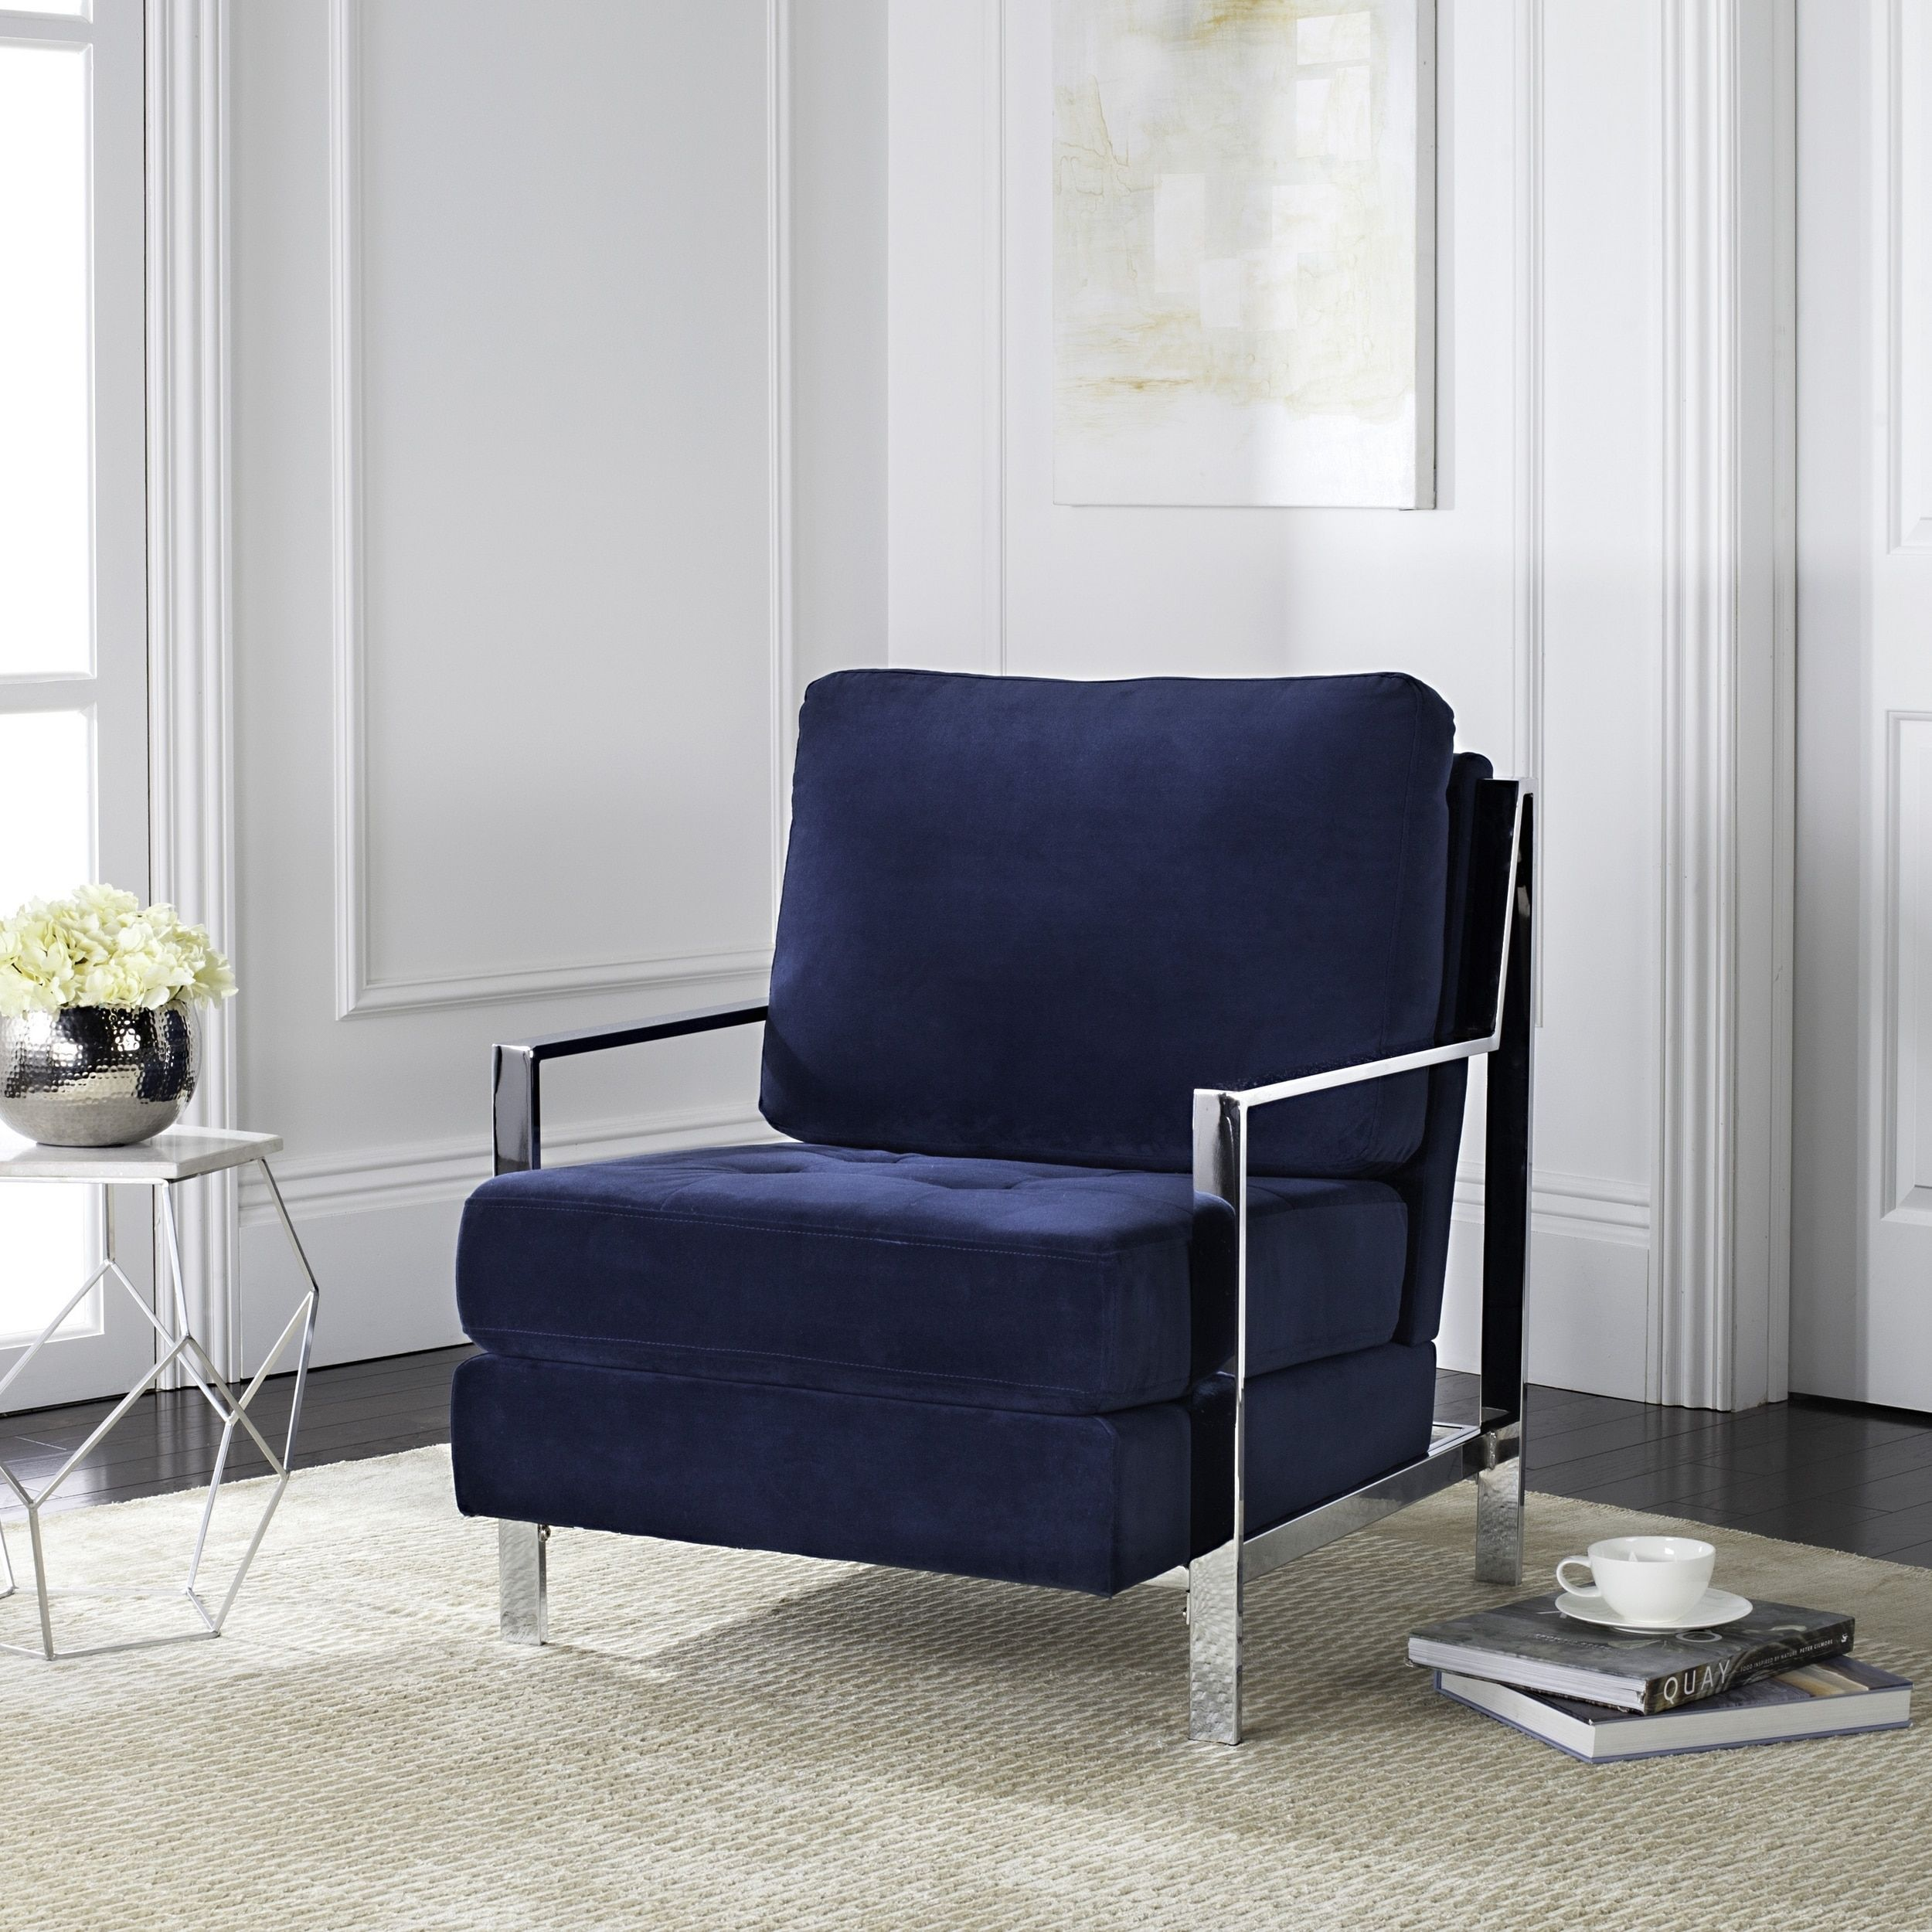 Safavieh Modern Walden Tufted Blue Velvet Accent Chair Fabric